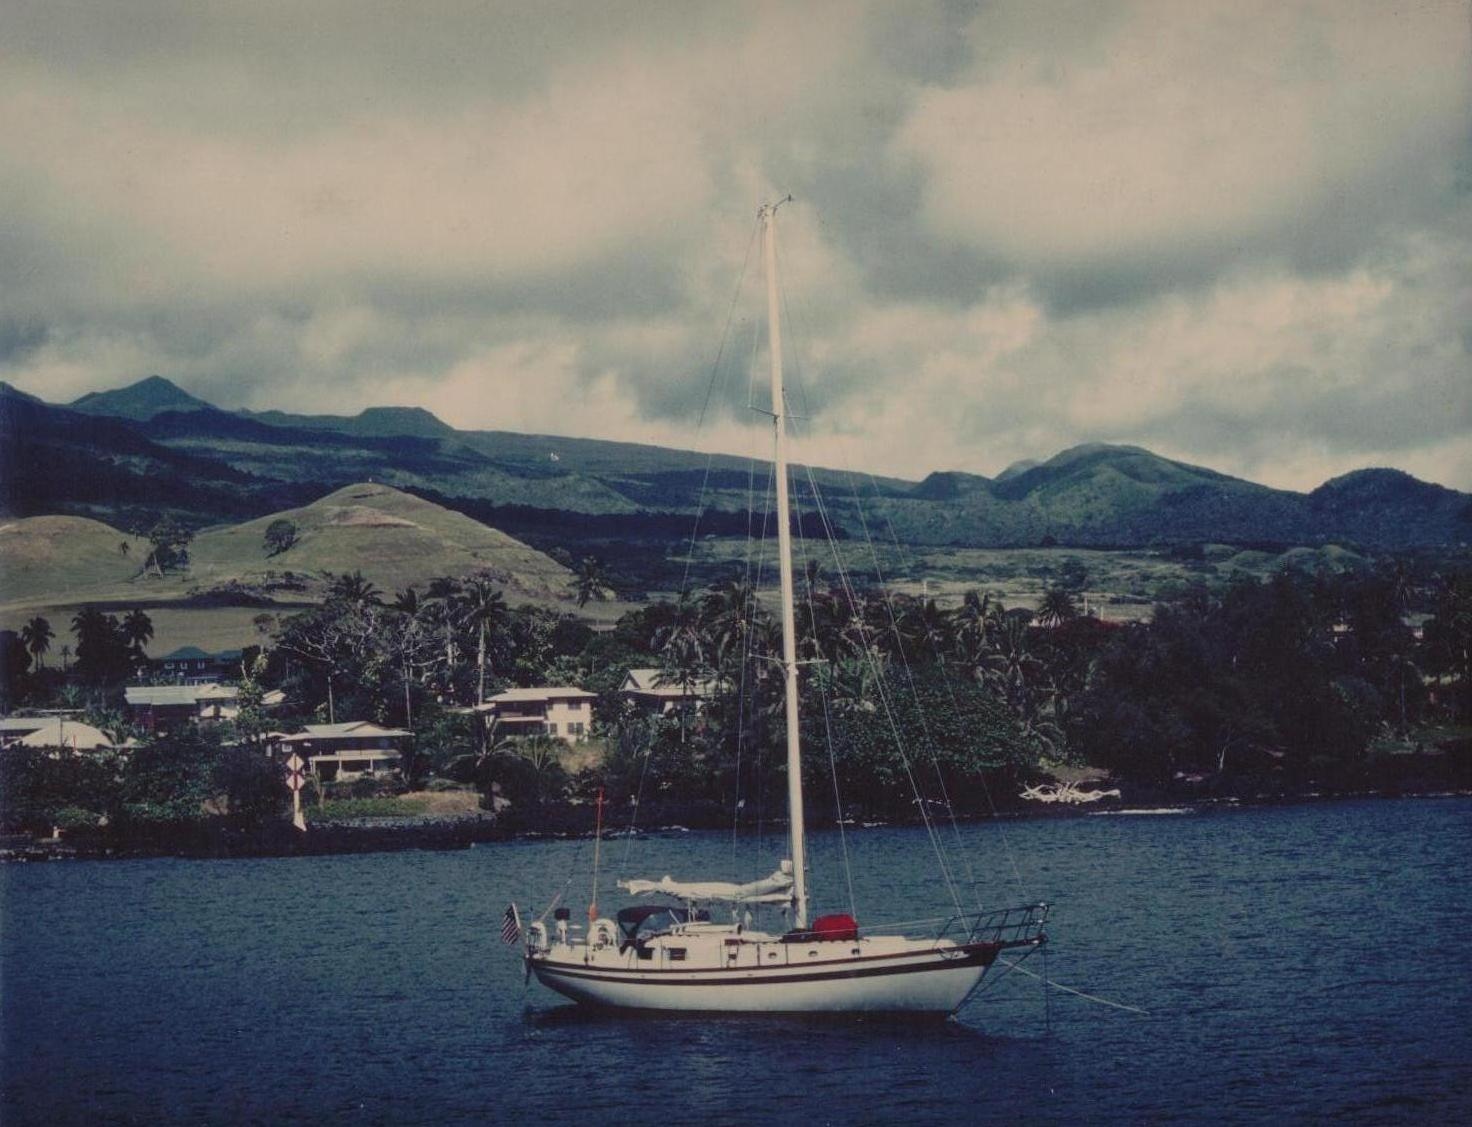 Click image for larger version  Name:Maluhia in Hana Bay, July 1979.jpg Views:243 Size:173.5 KB ID:8352